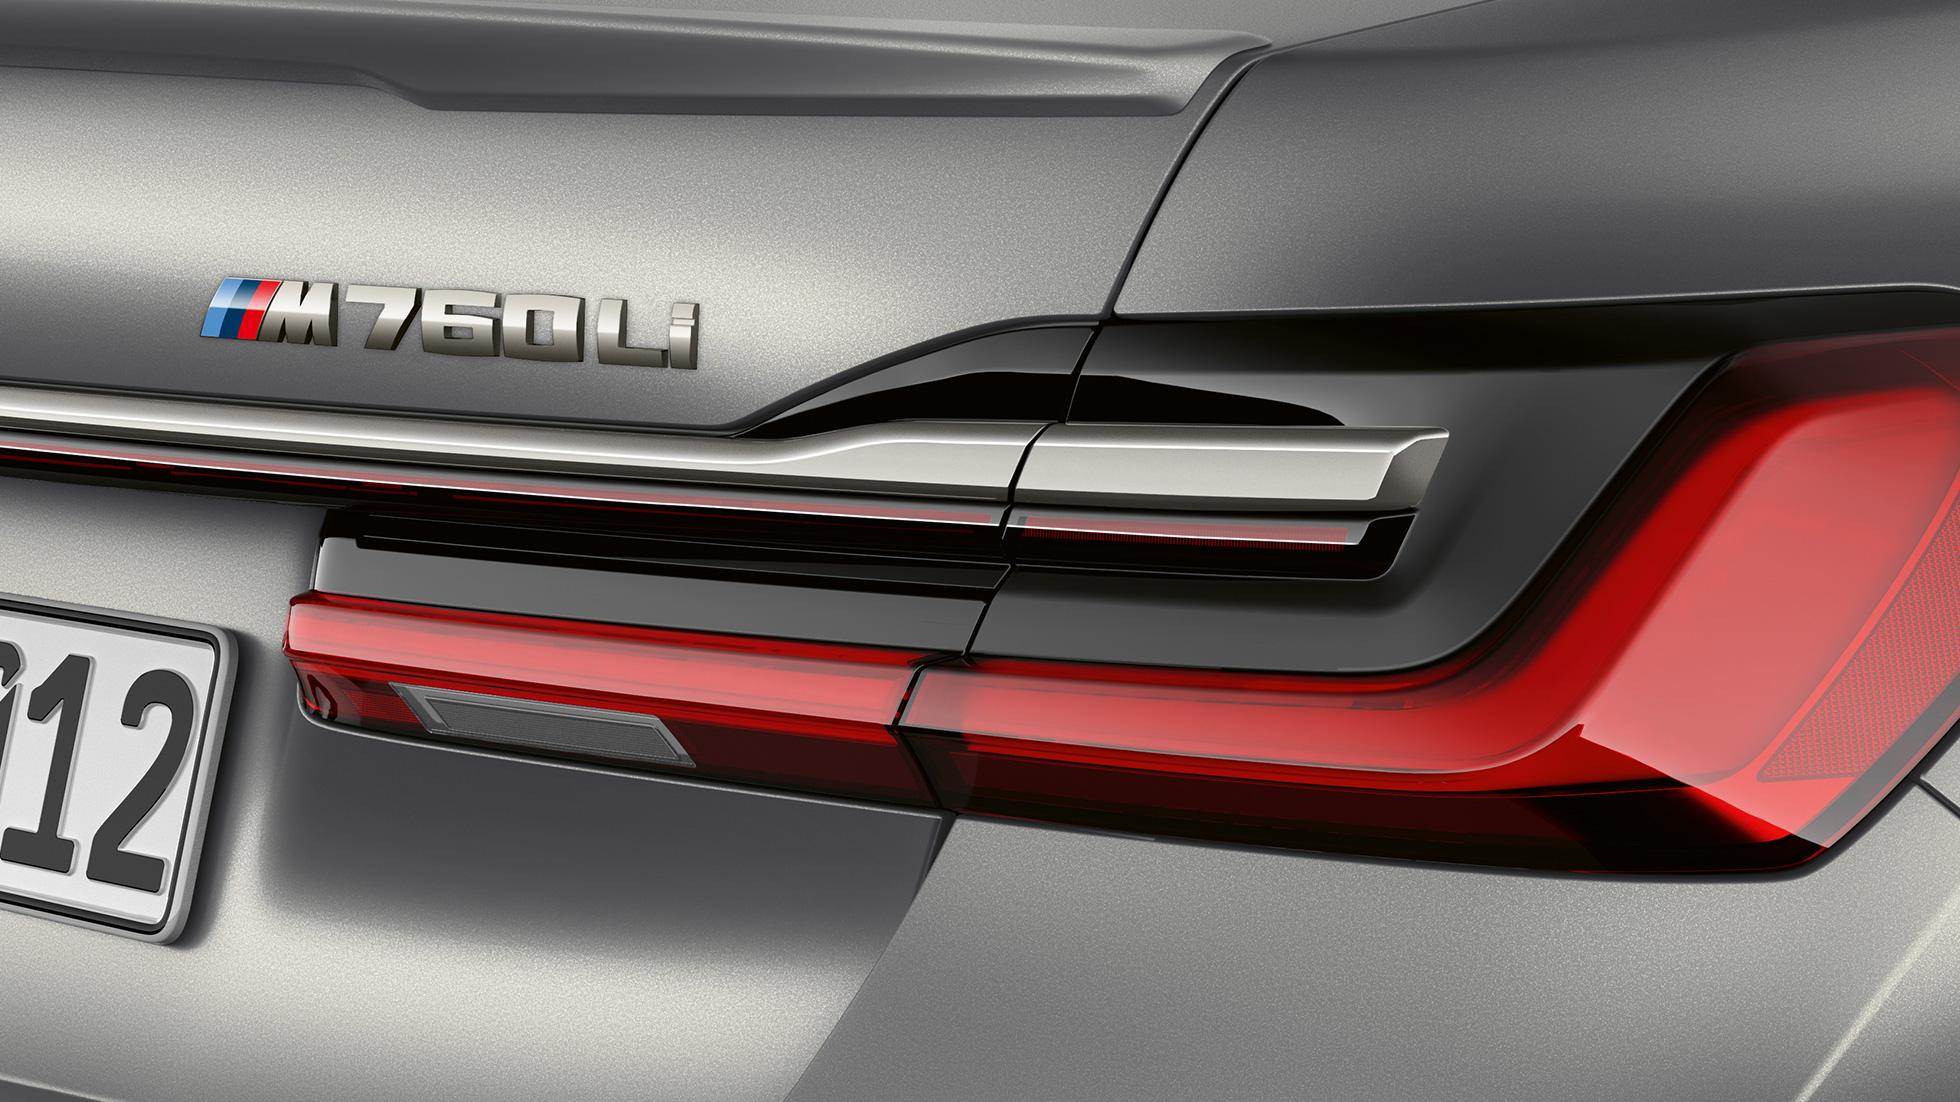 bmw-7series-sedan-inform-line-03-slide-06